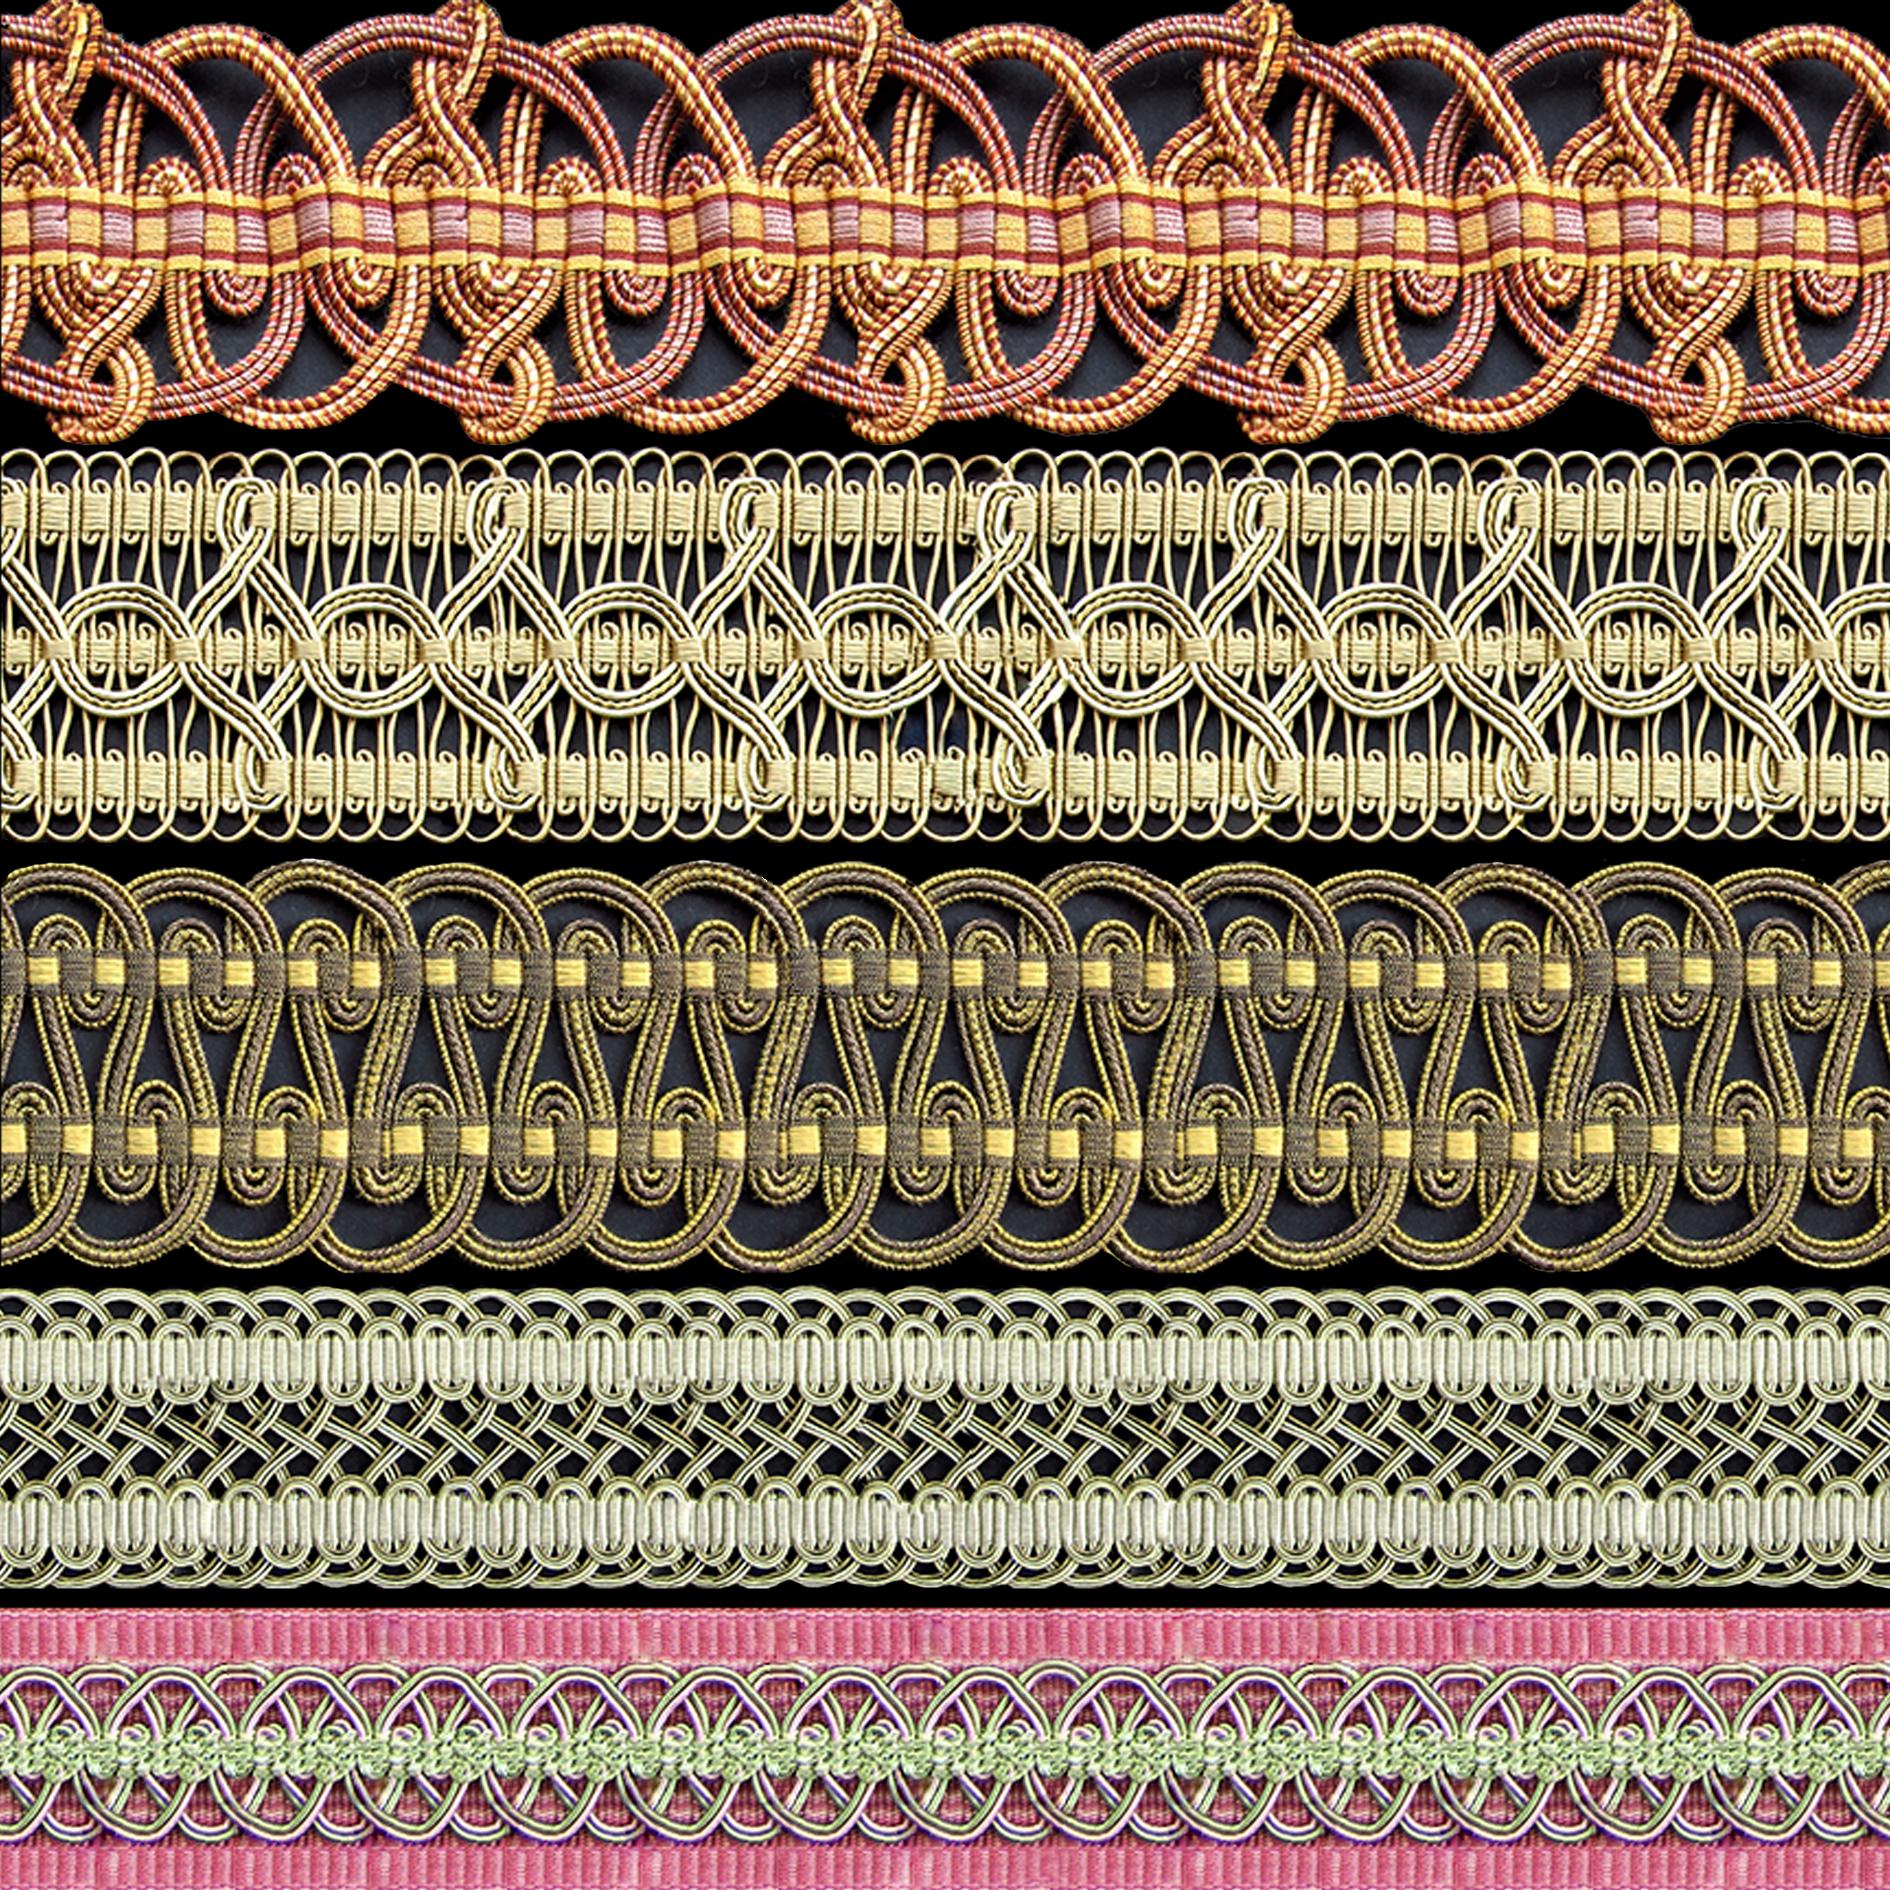 Ornate Trimming